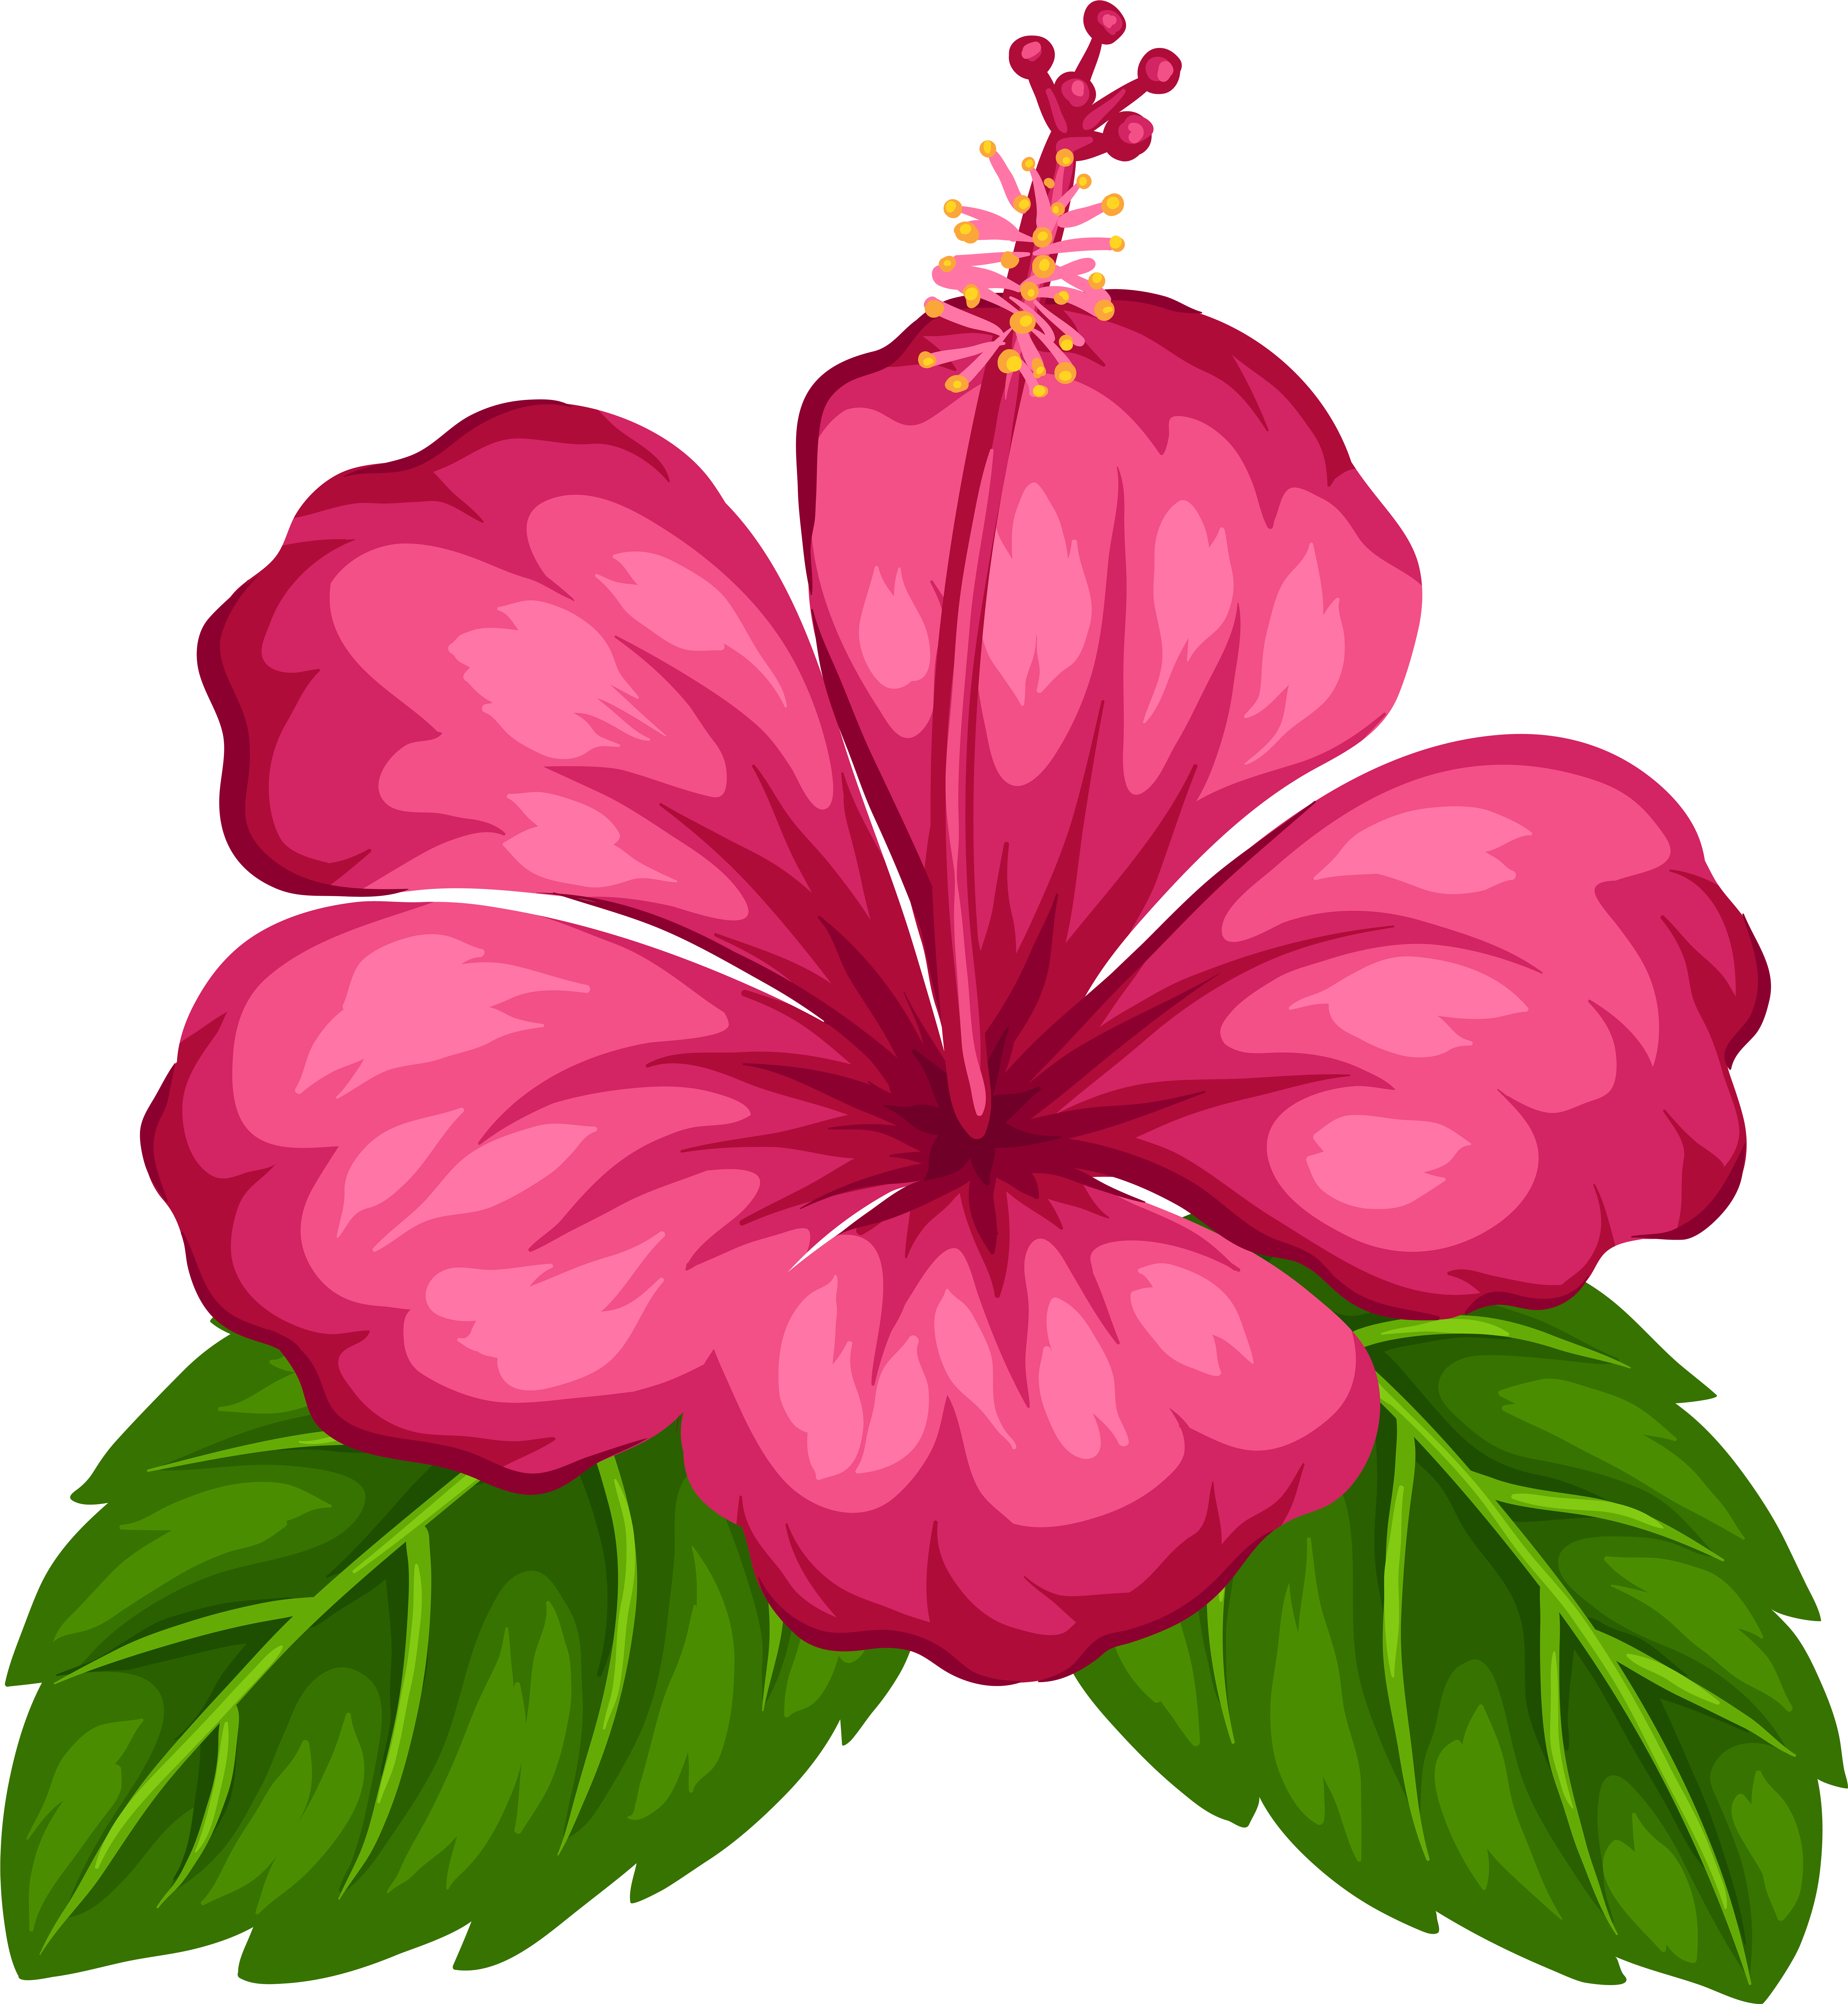 Картинки для детей на прозрачном фоне цветок